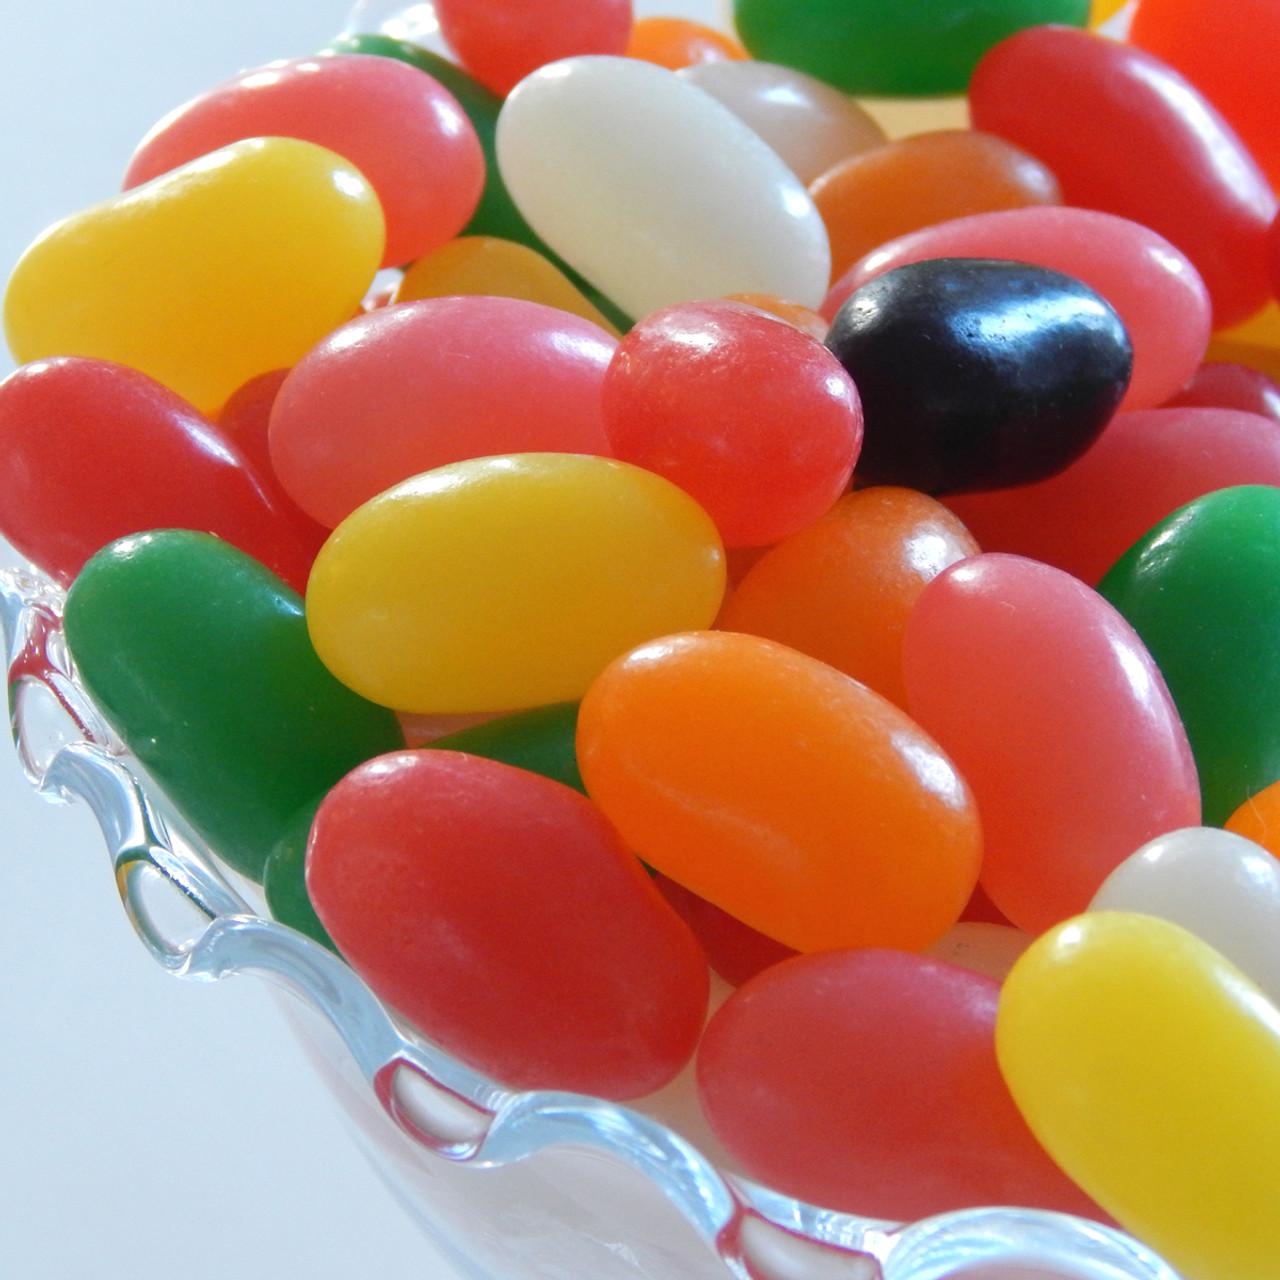 Jumbo Spice Jelly Beans 19 Oz Bag George J Howe Company